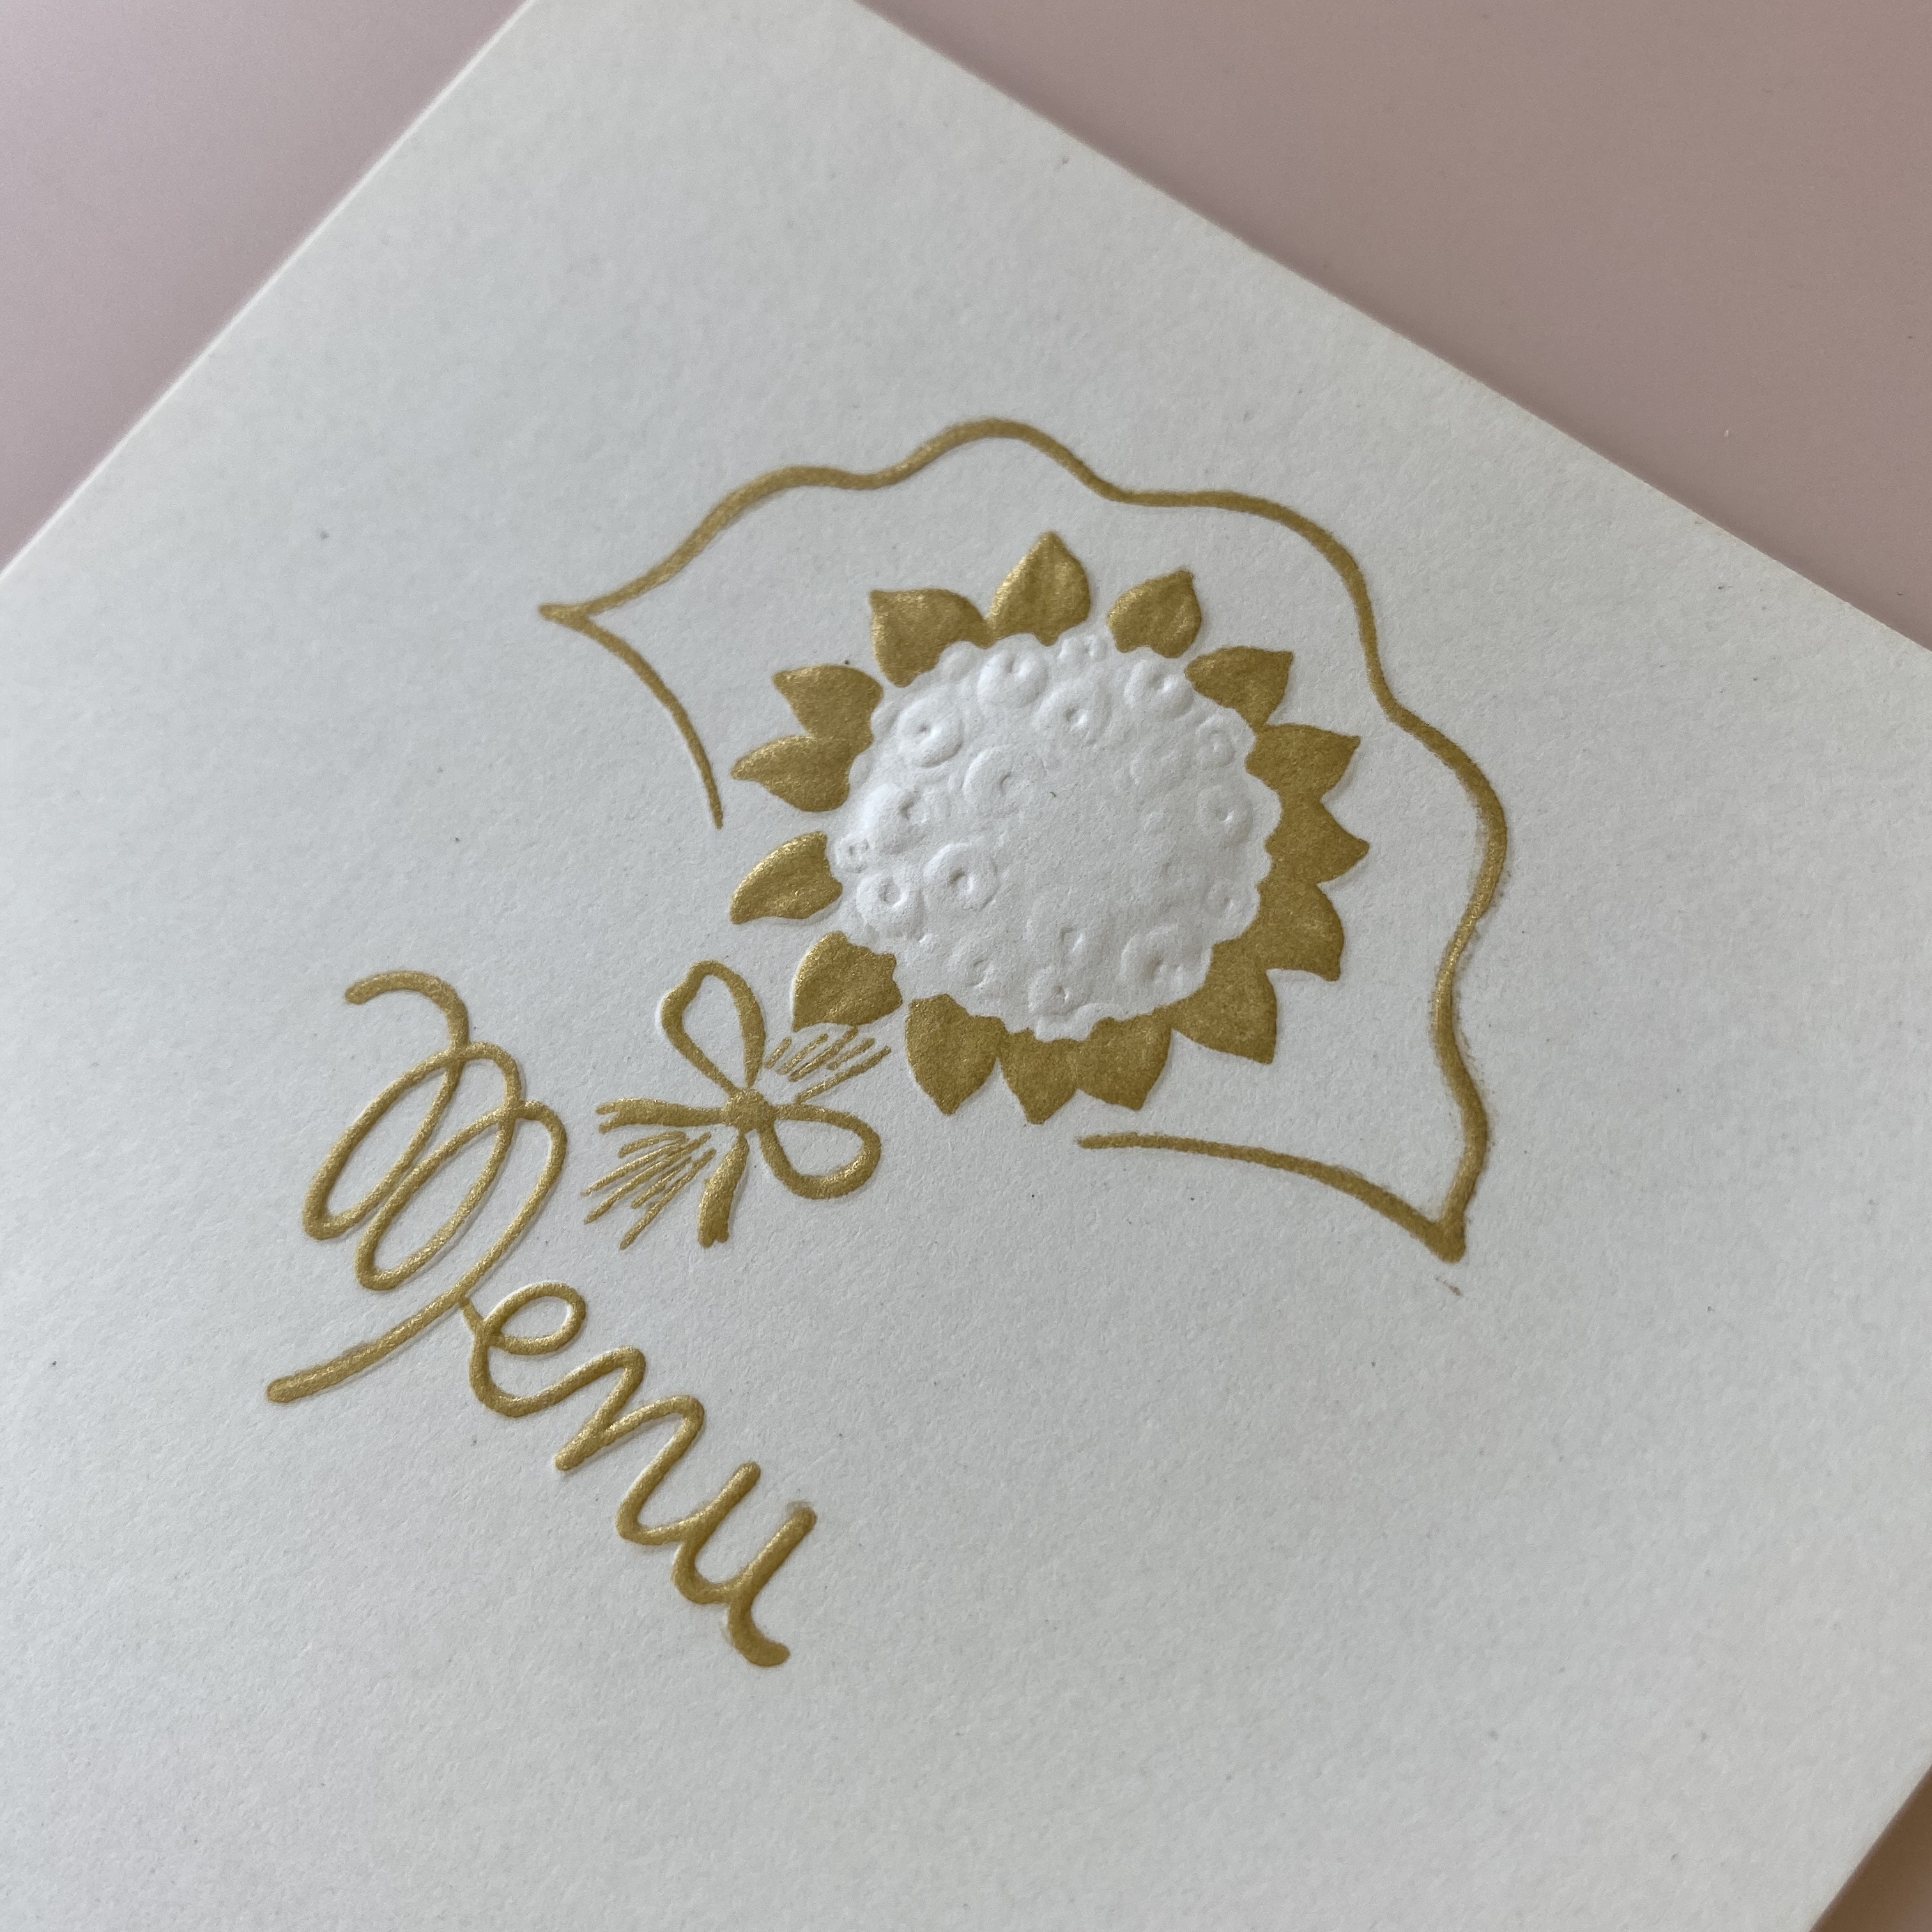 France  menuカード・ブーケ  3枚セット / vp0169